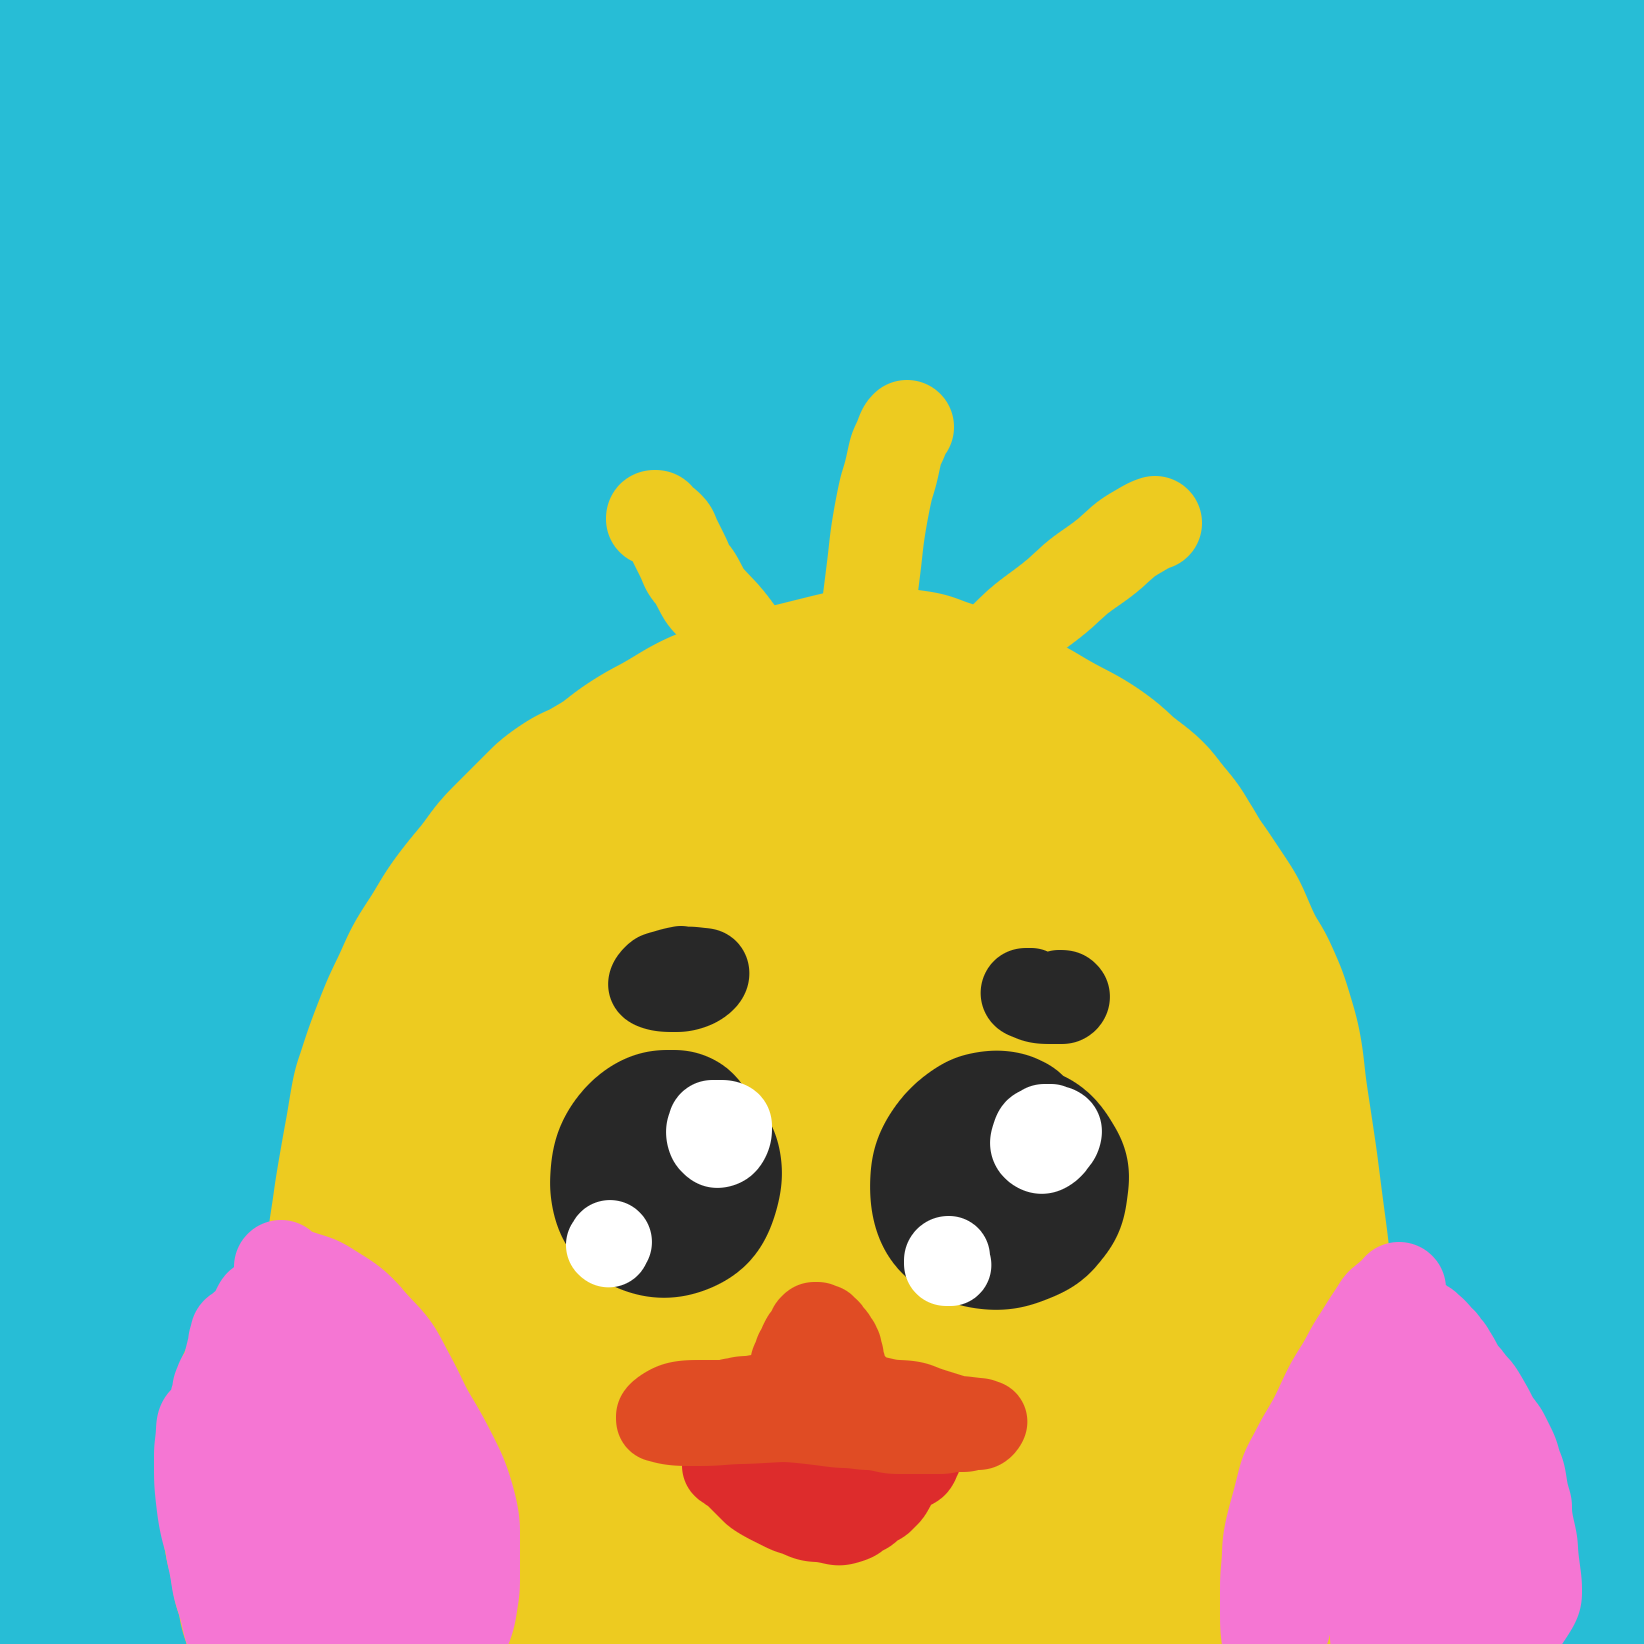 Profile picture for the comic artist, SaraBLQ